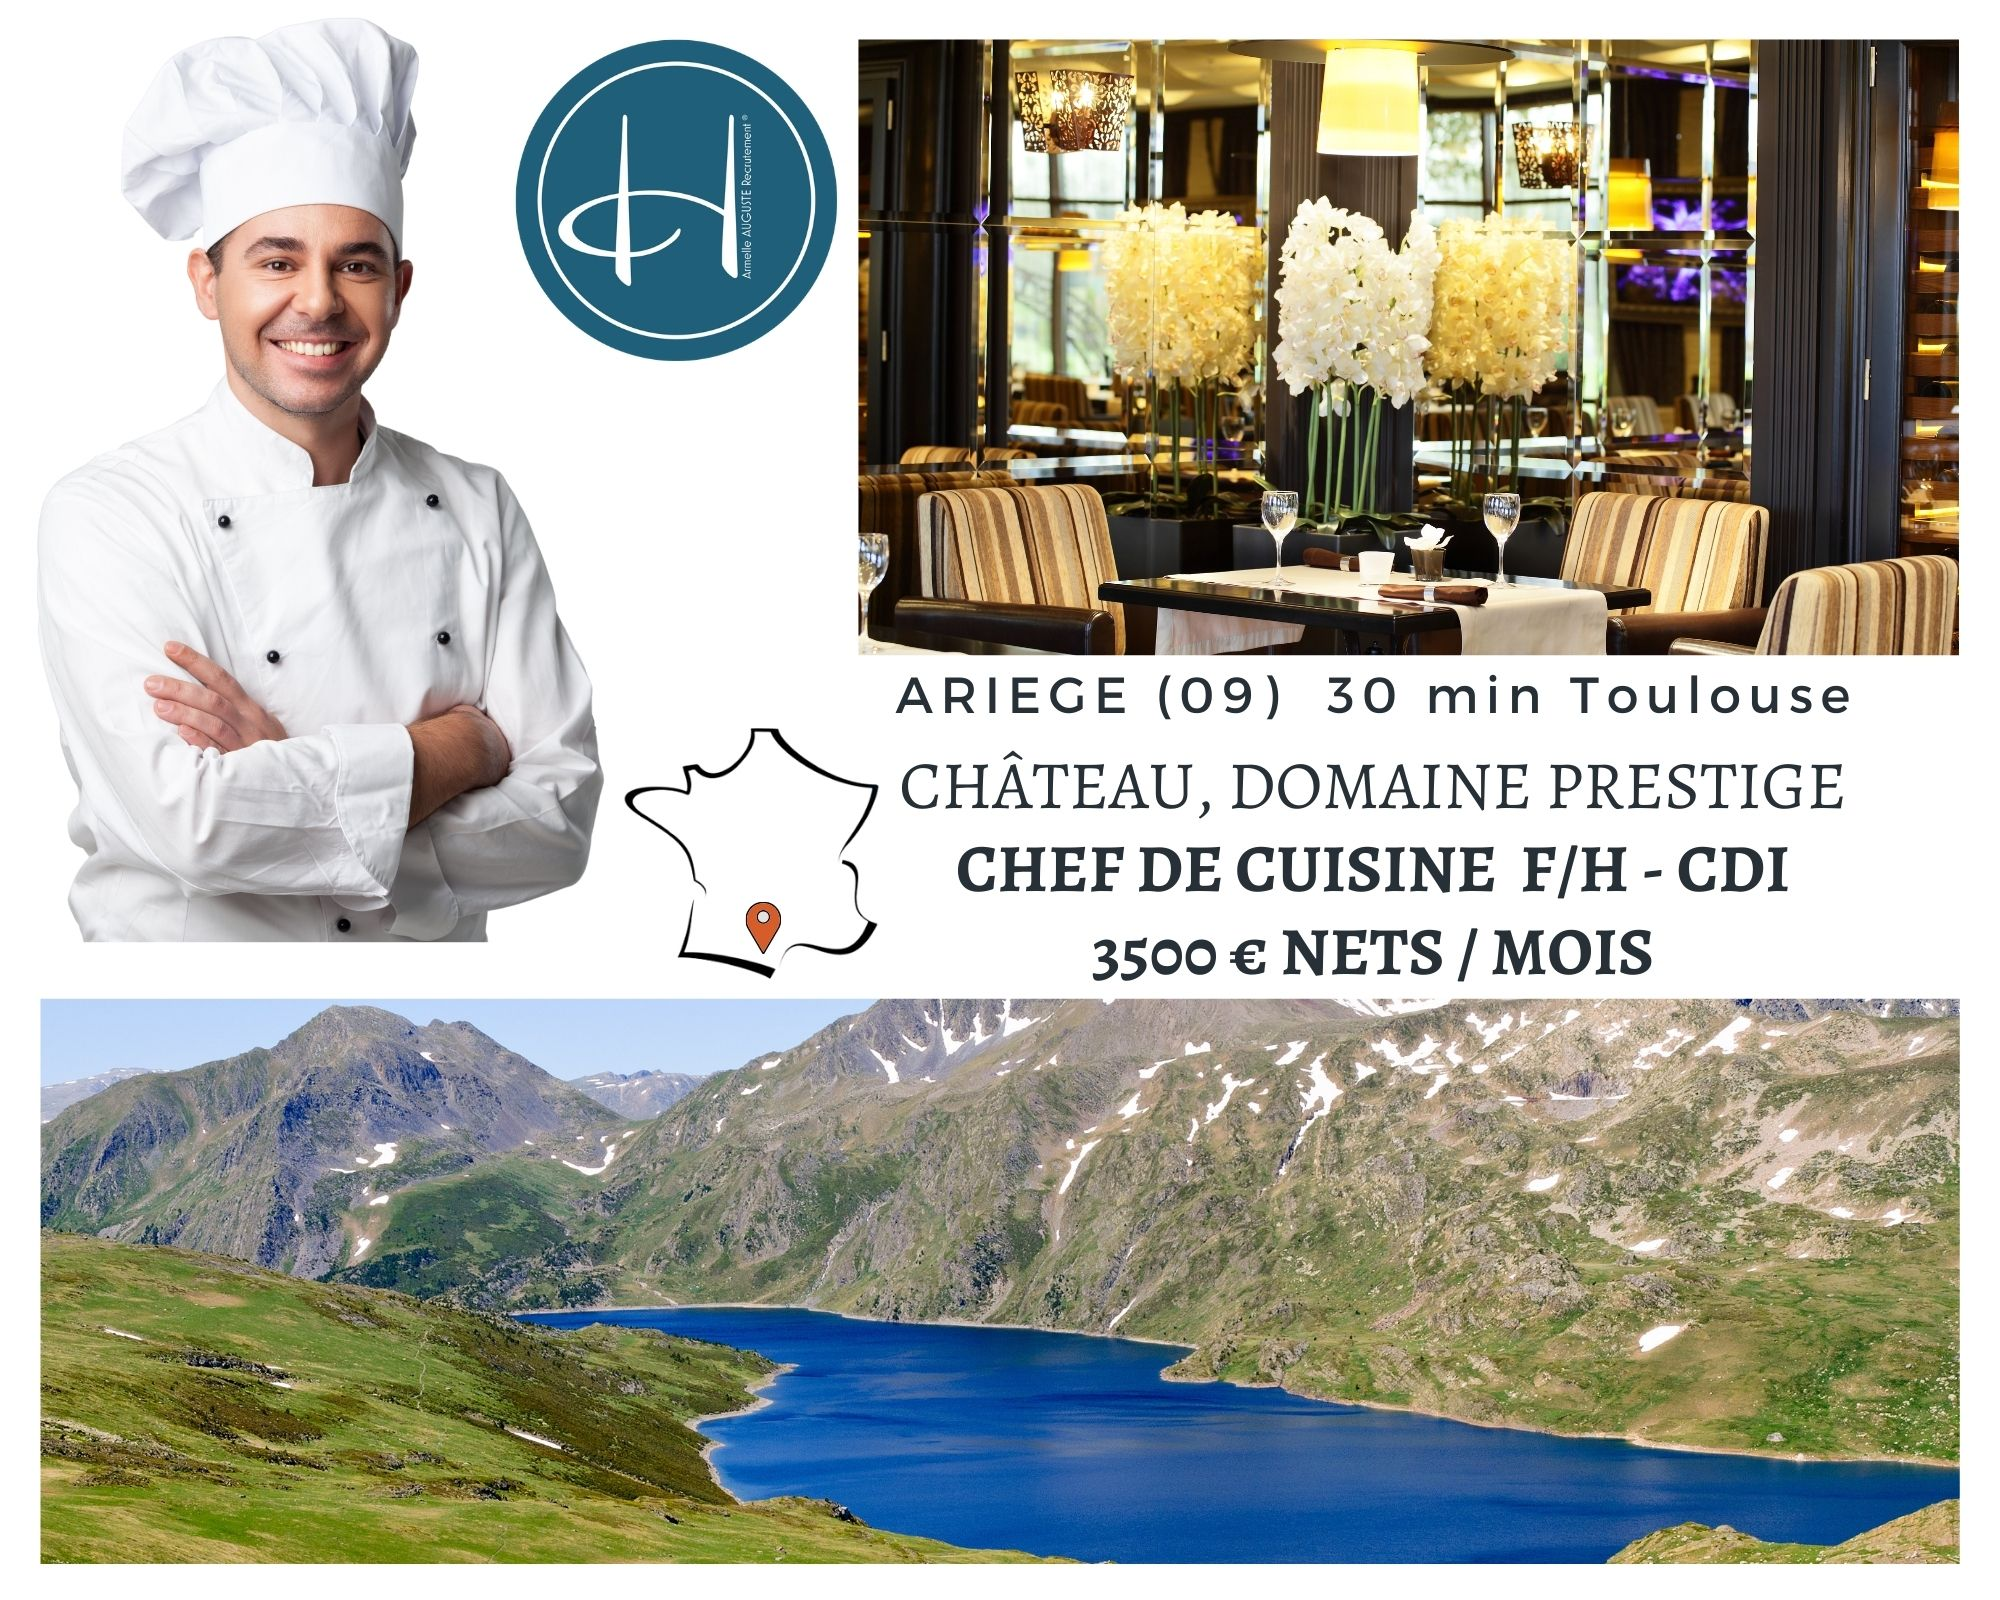 Recrutement: Chef de cuisine - Château domaine Prestige - Ariège F/H chez Armelle AUGUSTE Recrutement® à Foix